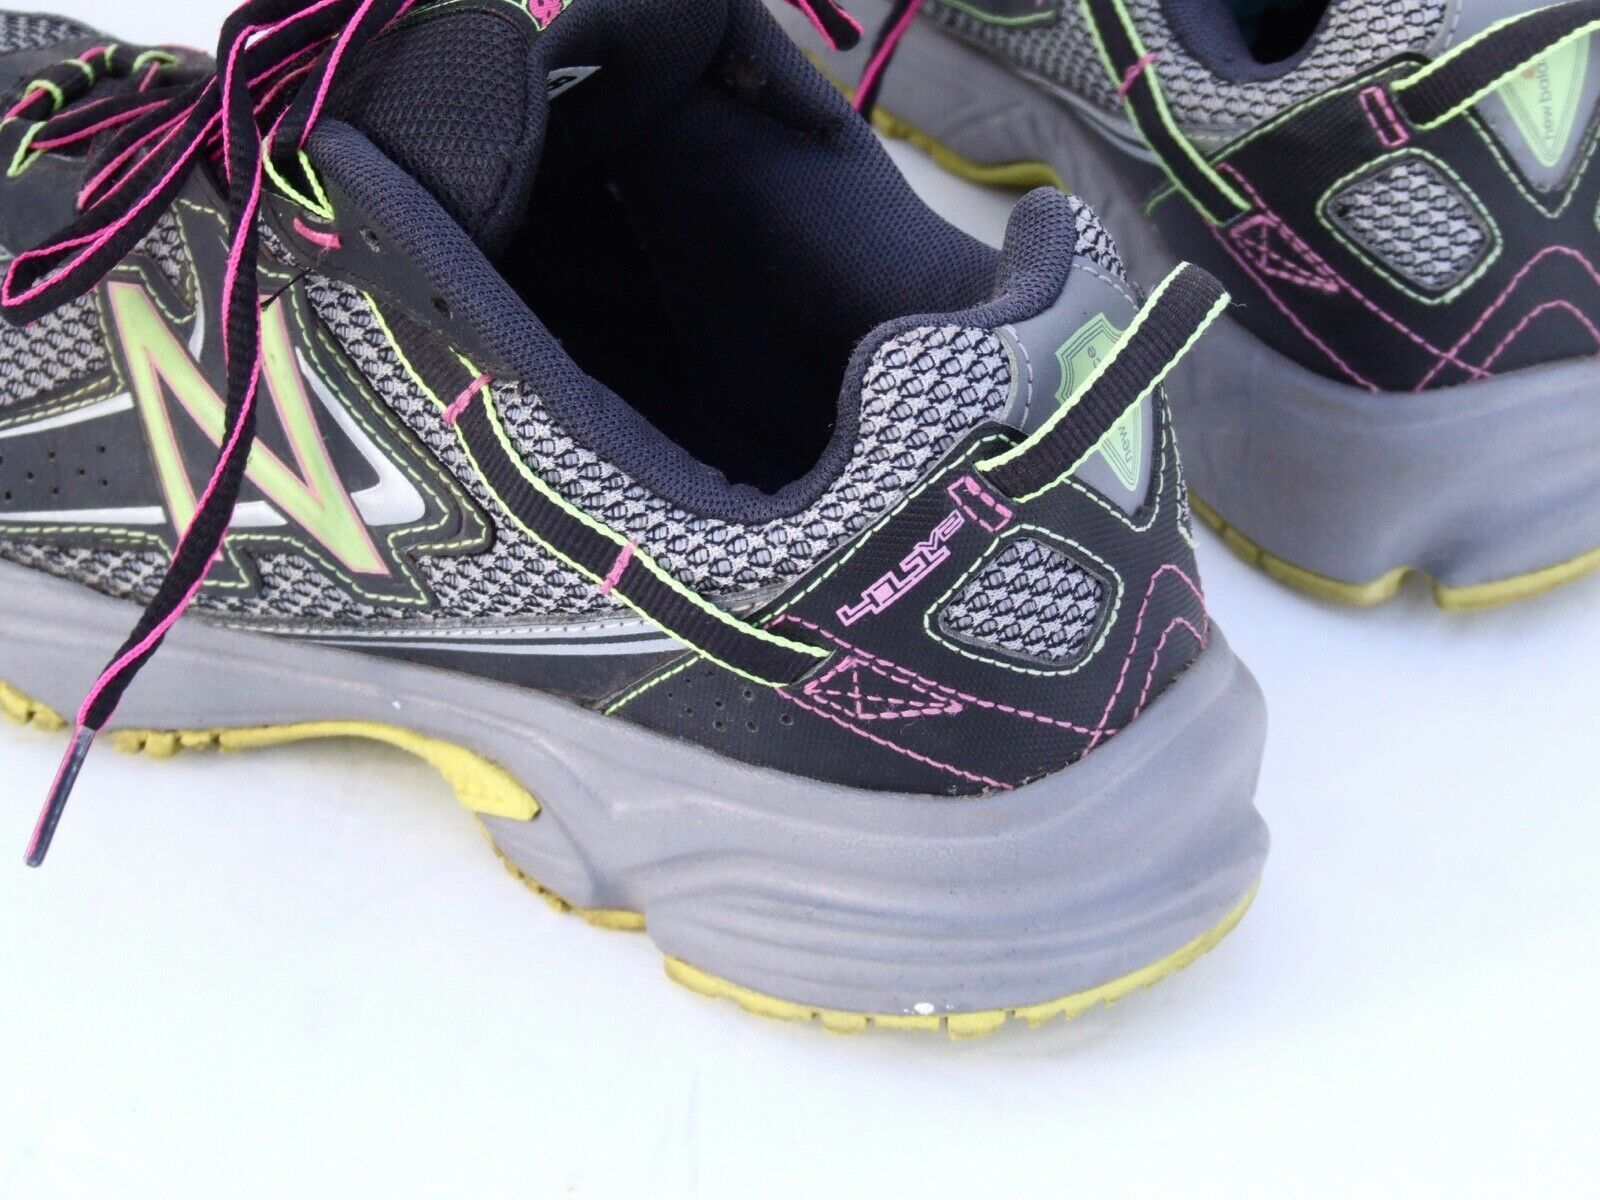 calor Fuera de plazo Honorable  NEW BALANCE WOMEN Running Shoes Sneakers Trail All Terrain Athletic 411 V2  8.5 M | Running shoes sneakers, Womens running shoes, Running women